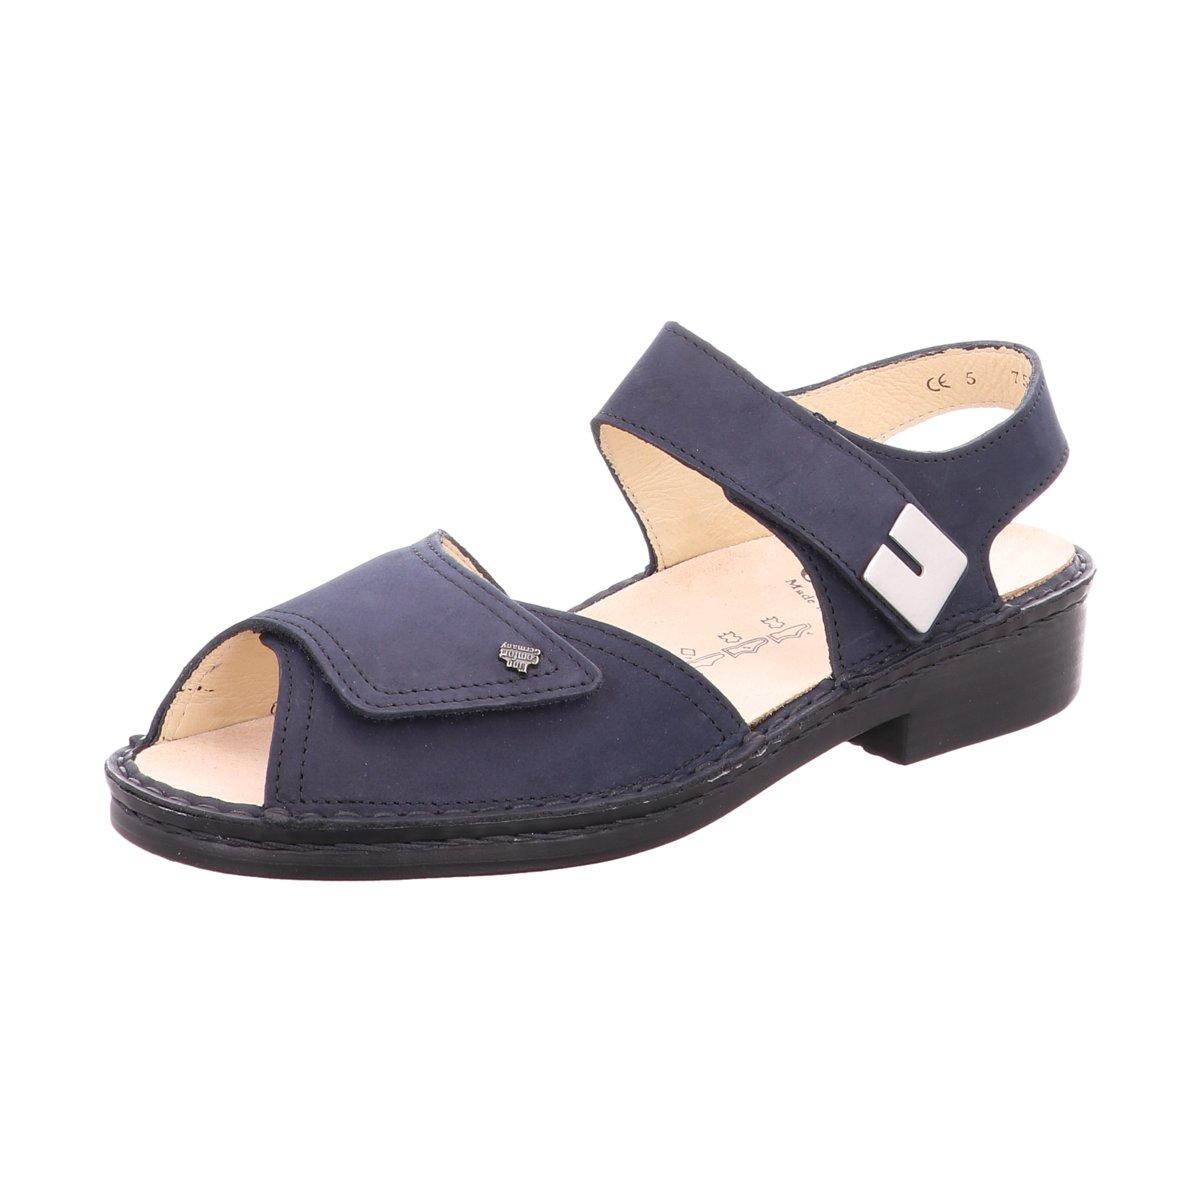 FinnComfort Damen Sandaletten Luxor Luxor 046048 blau 436657